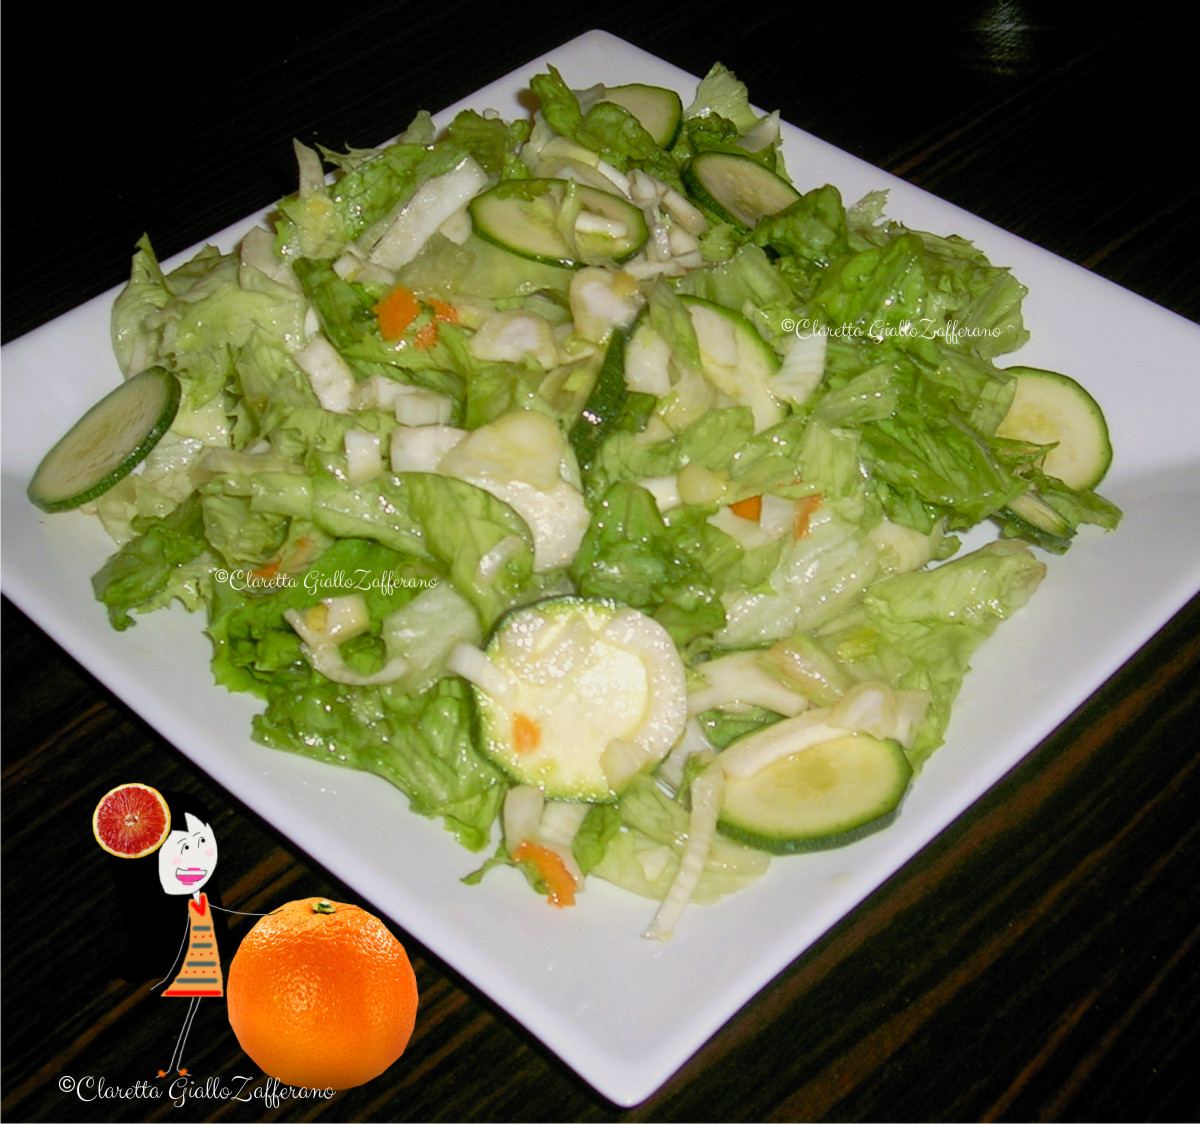 Eccezionale Insalata mista di verdure crude | Ricetta facile | Insalata di arance FJ45